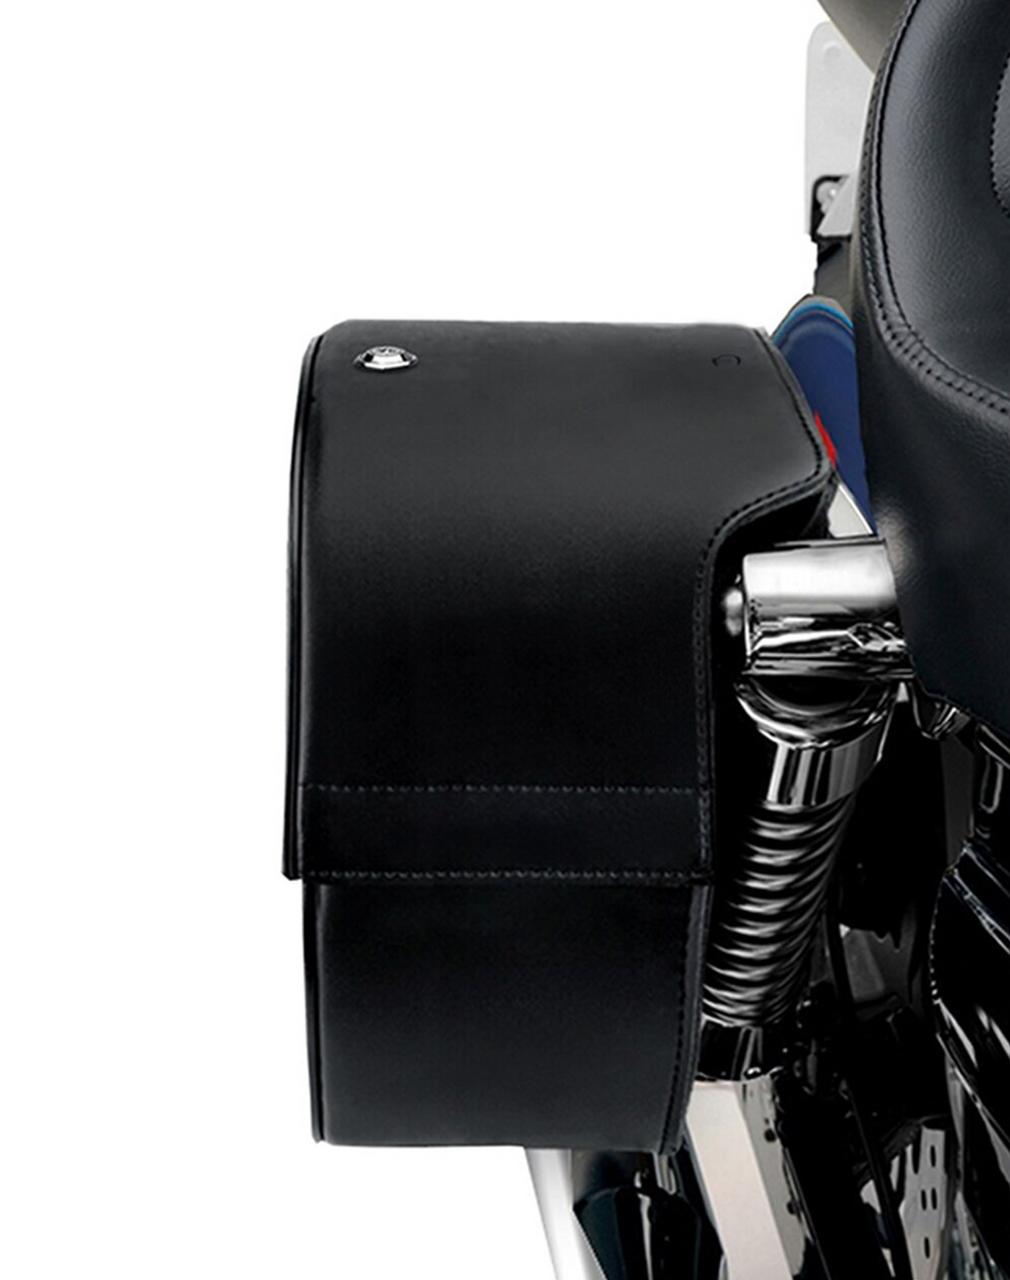 Viking Shock Cutout Warrior Slanted Large Motorcycle Saddlebags For Harley Sportster Superlow Shock Cutout View